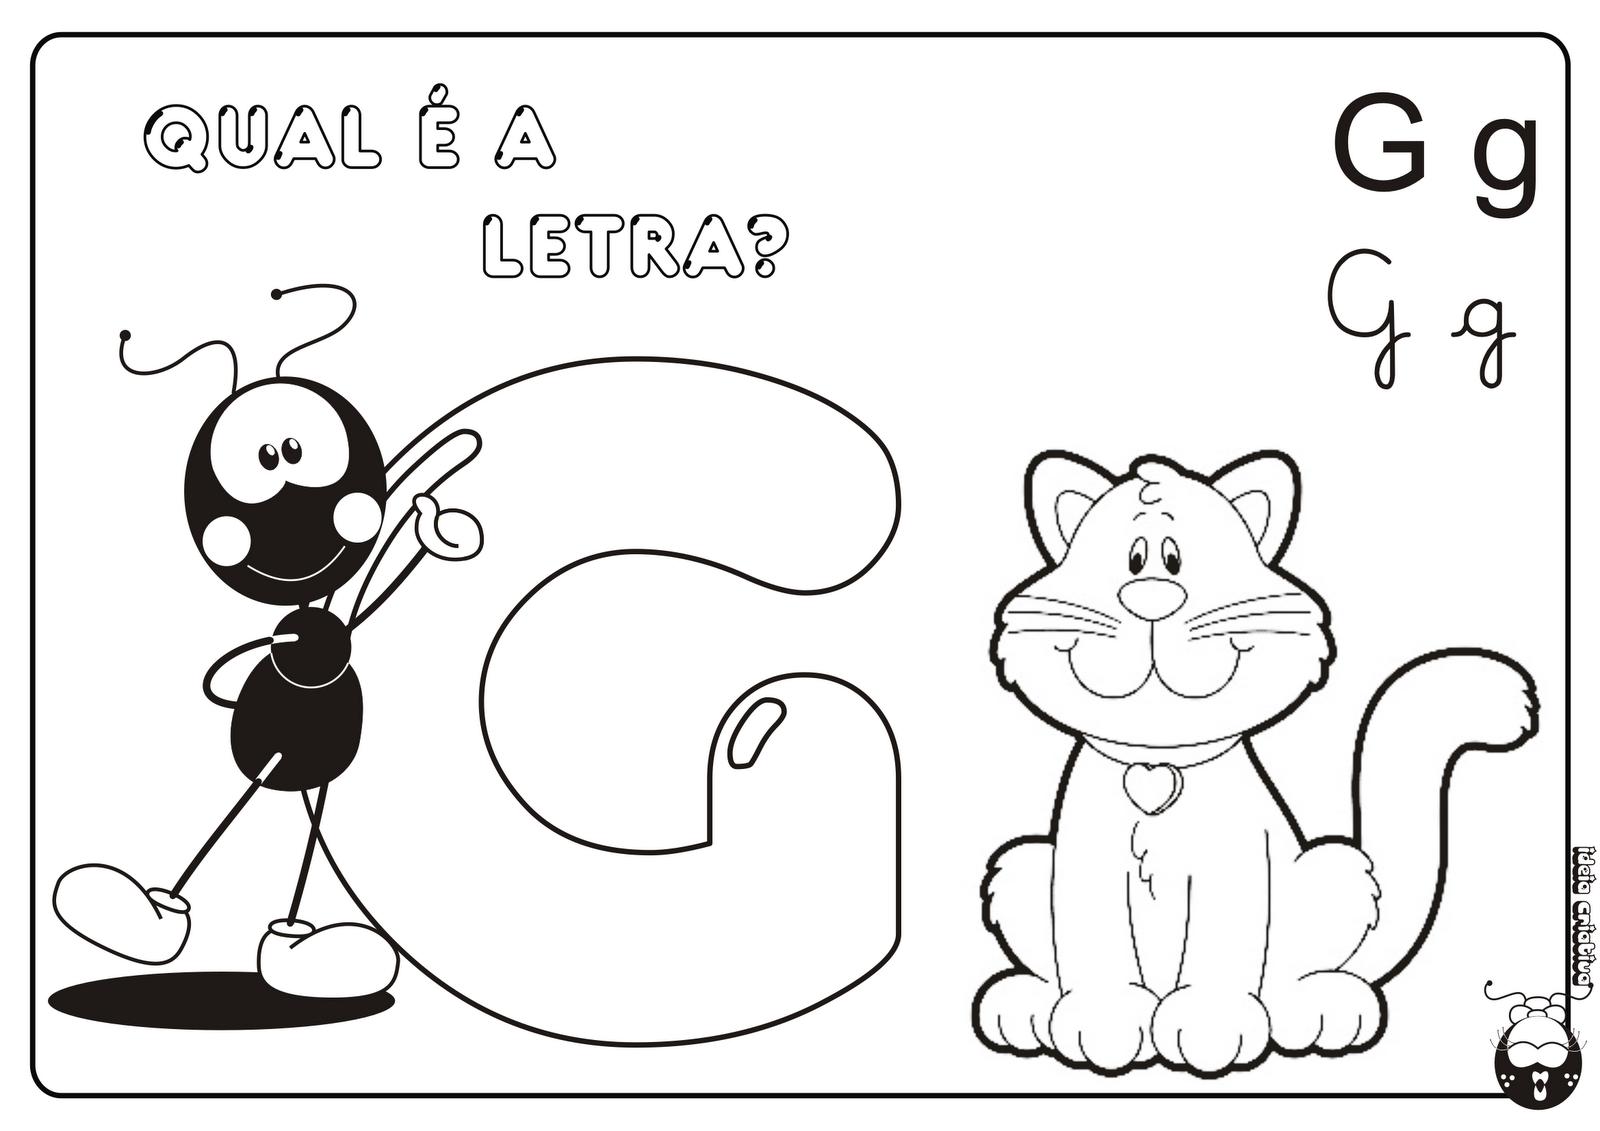 Alfabeto Smilinguido 4 tipos de letra para Baixar Grátis Letra G